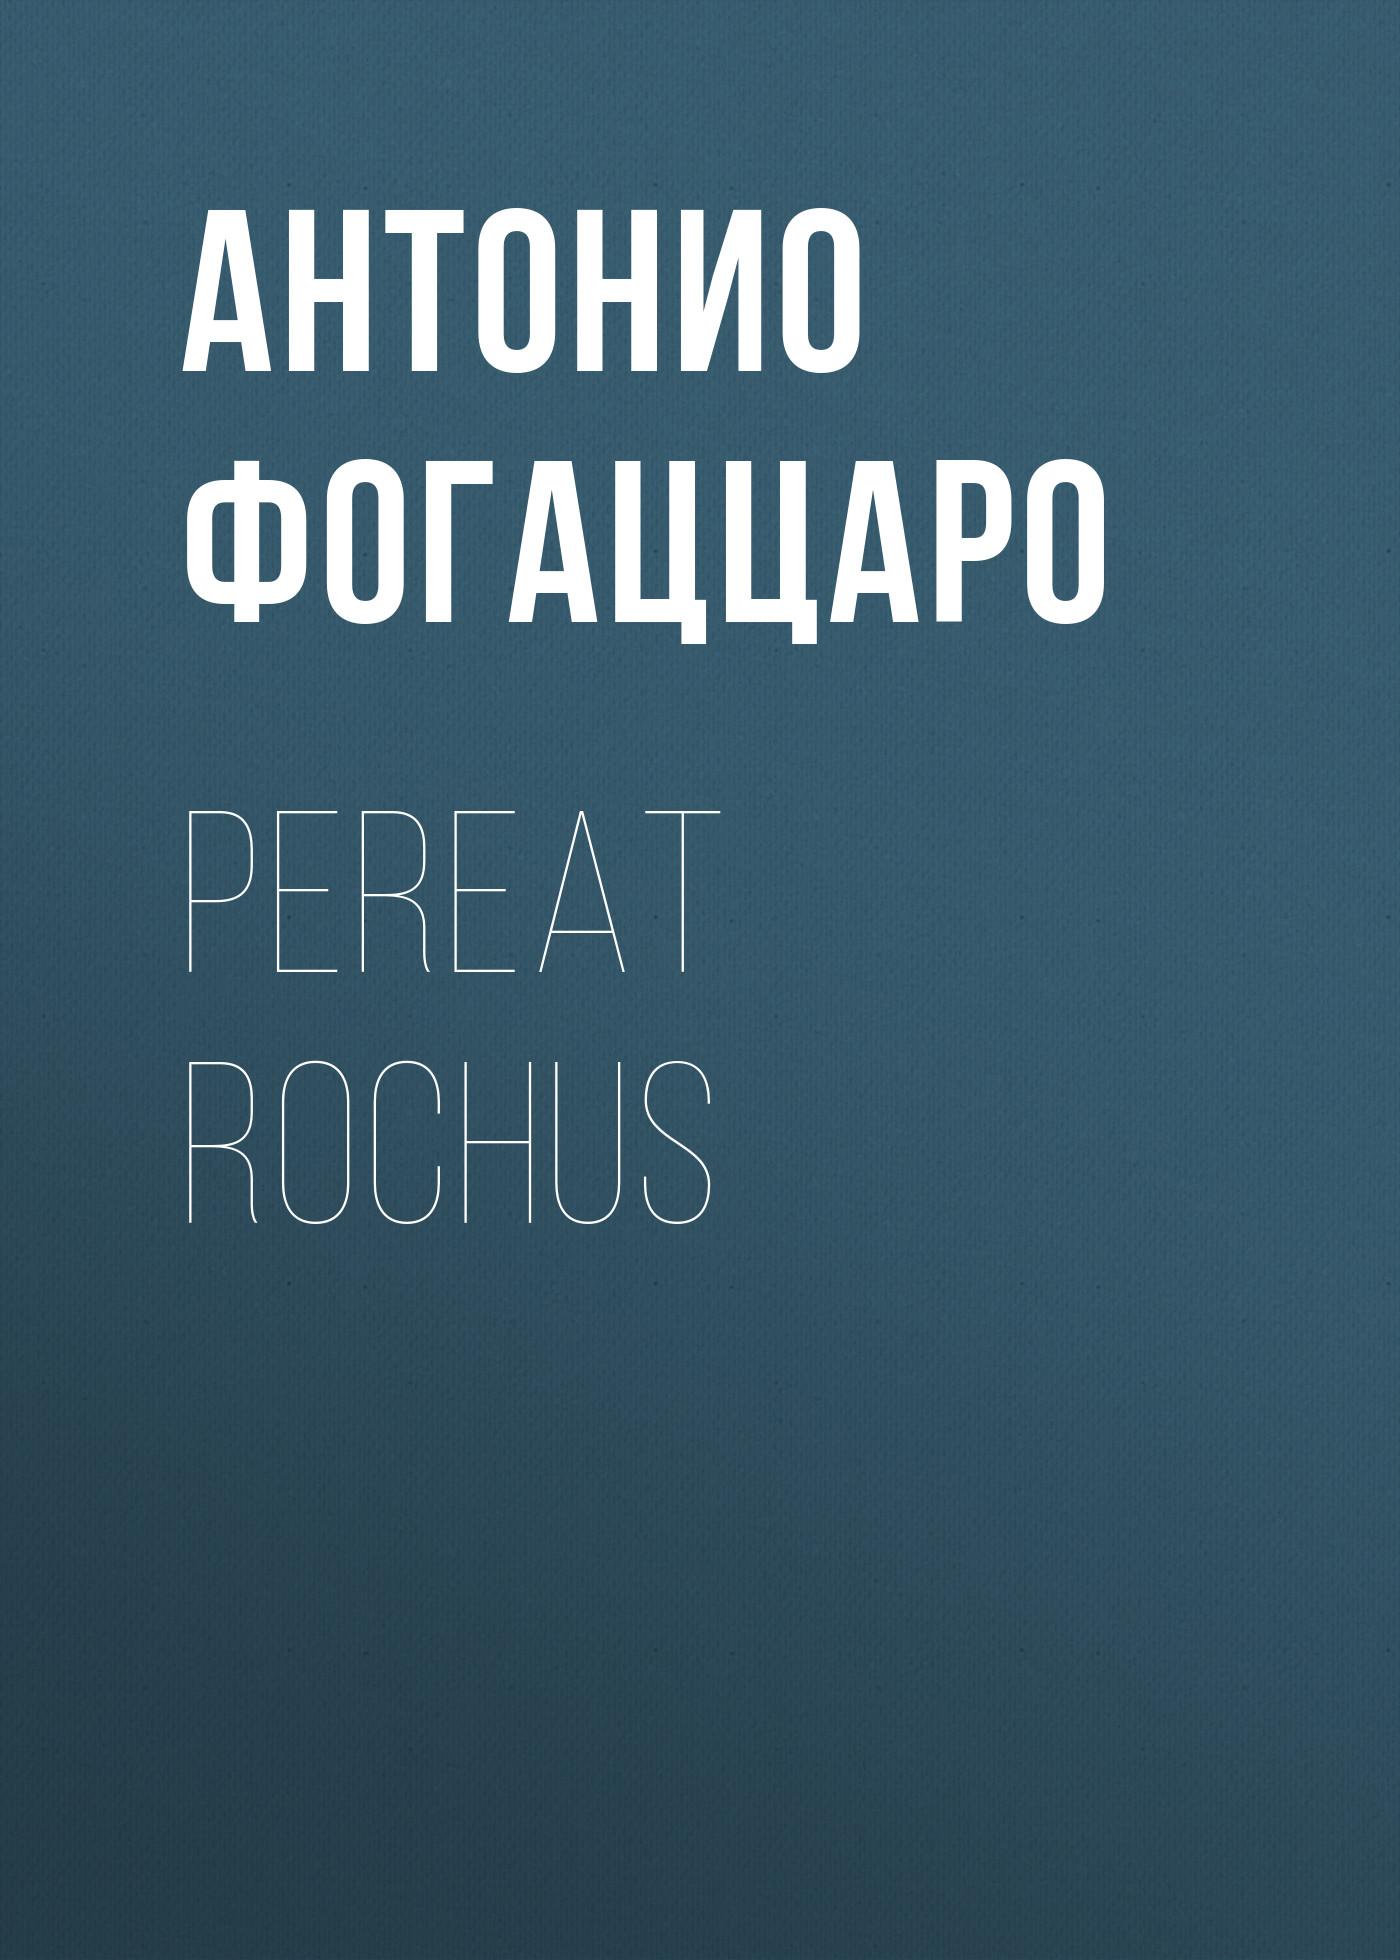 Антонио Фогаццаро Pereat Rochus аксессуар для упаковки птичка 7 см